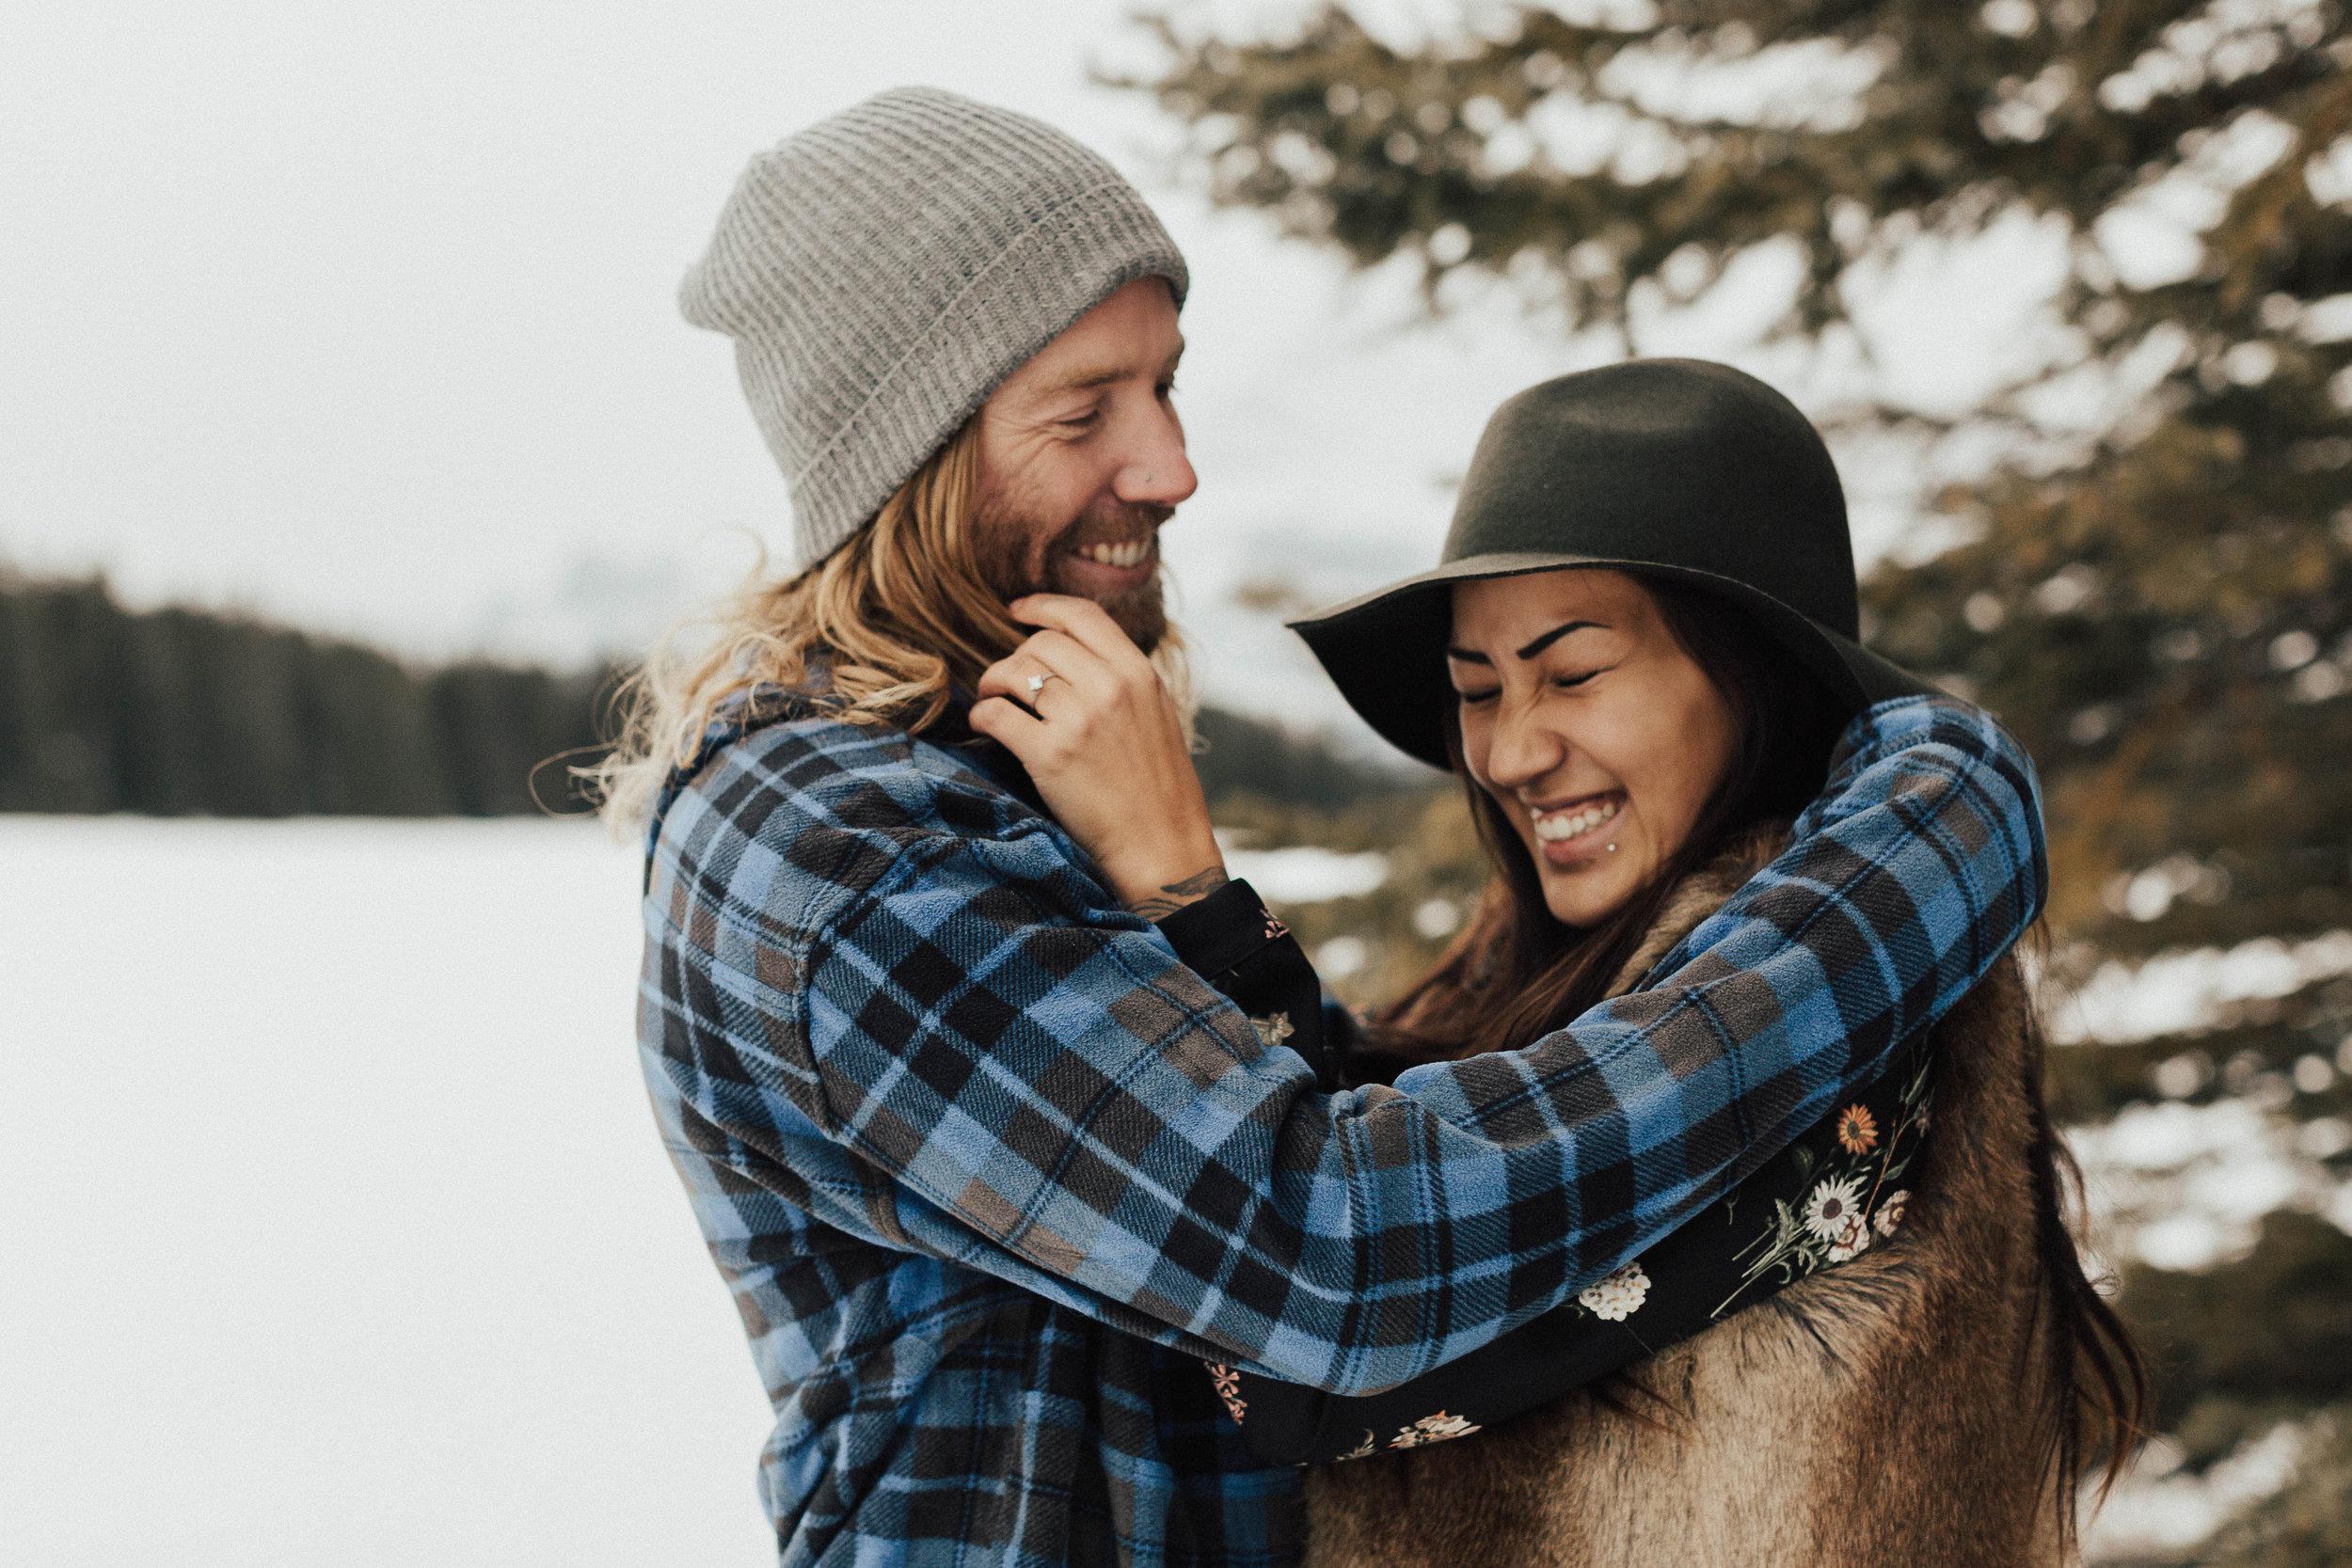 Banff Engagement Photographer - Winter Mountain Adventure Engagement Session - Michelle Larmand Photography-027